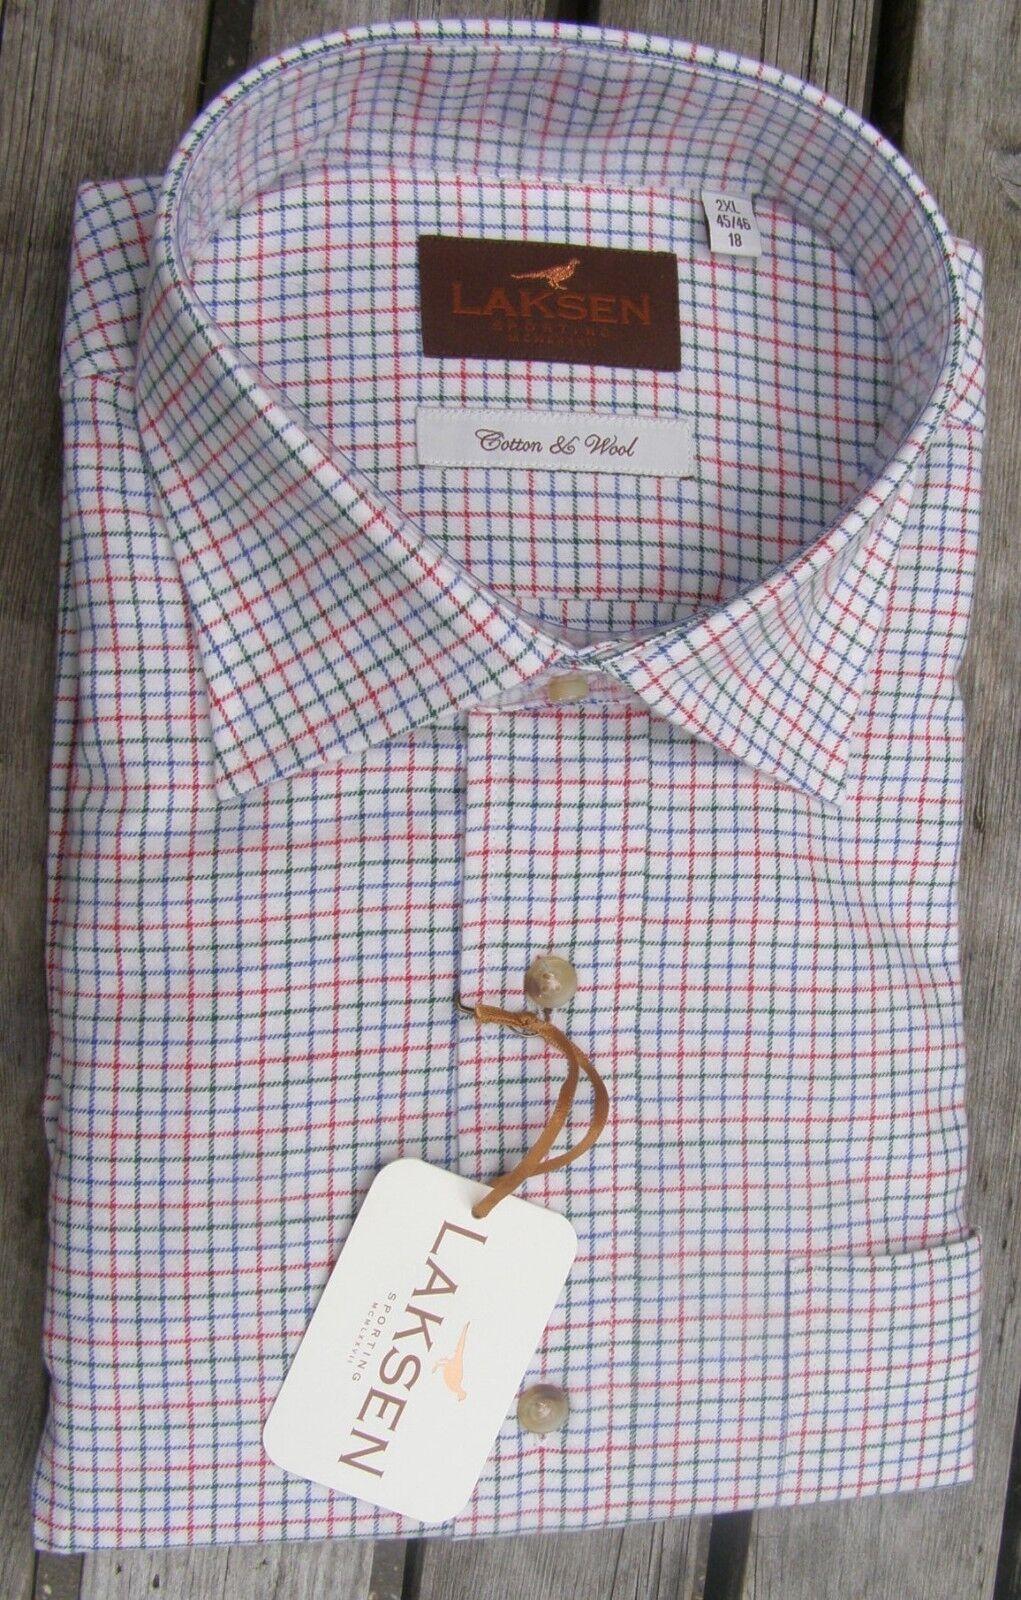 Laksen Men's Alex Shirt  15  S Cotton wool blend for extra warmth